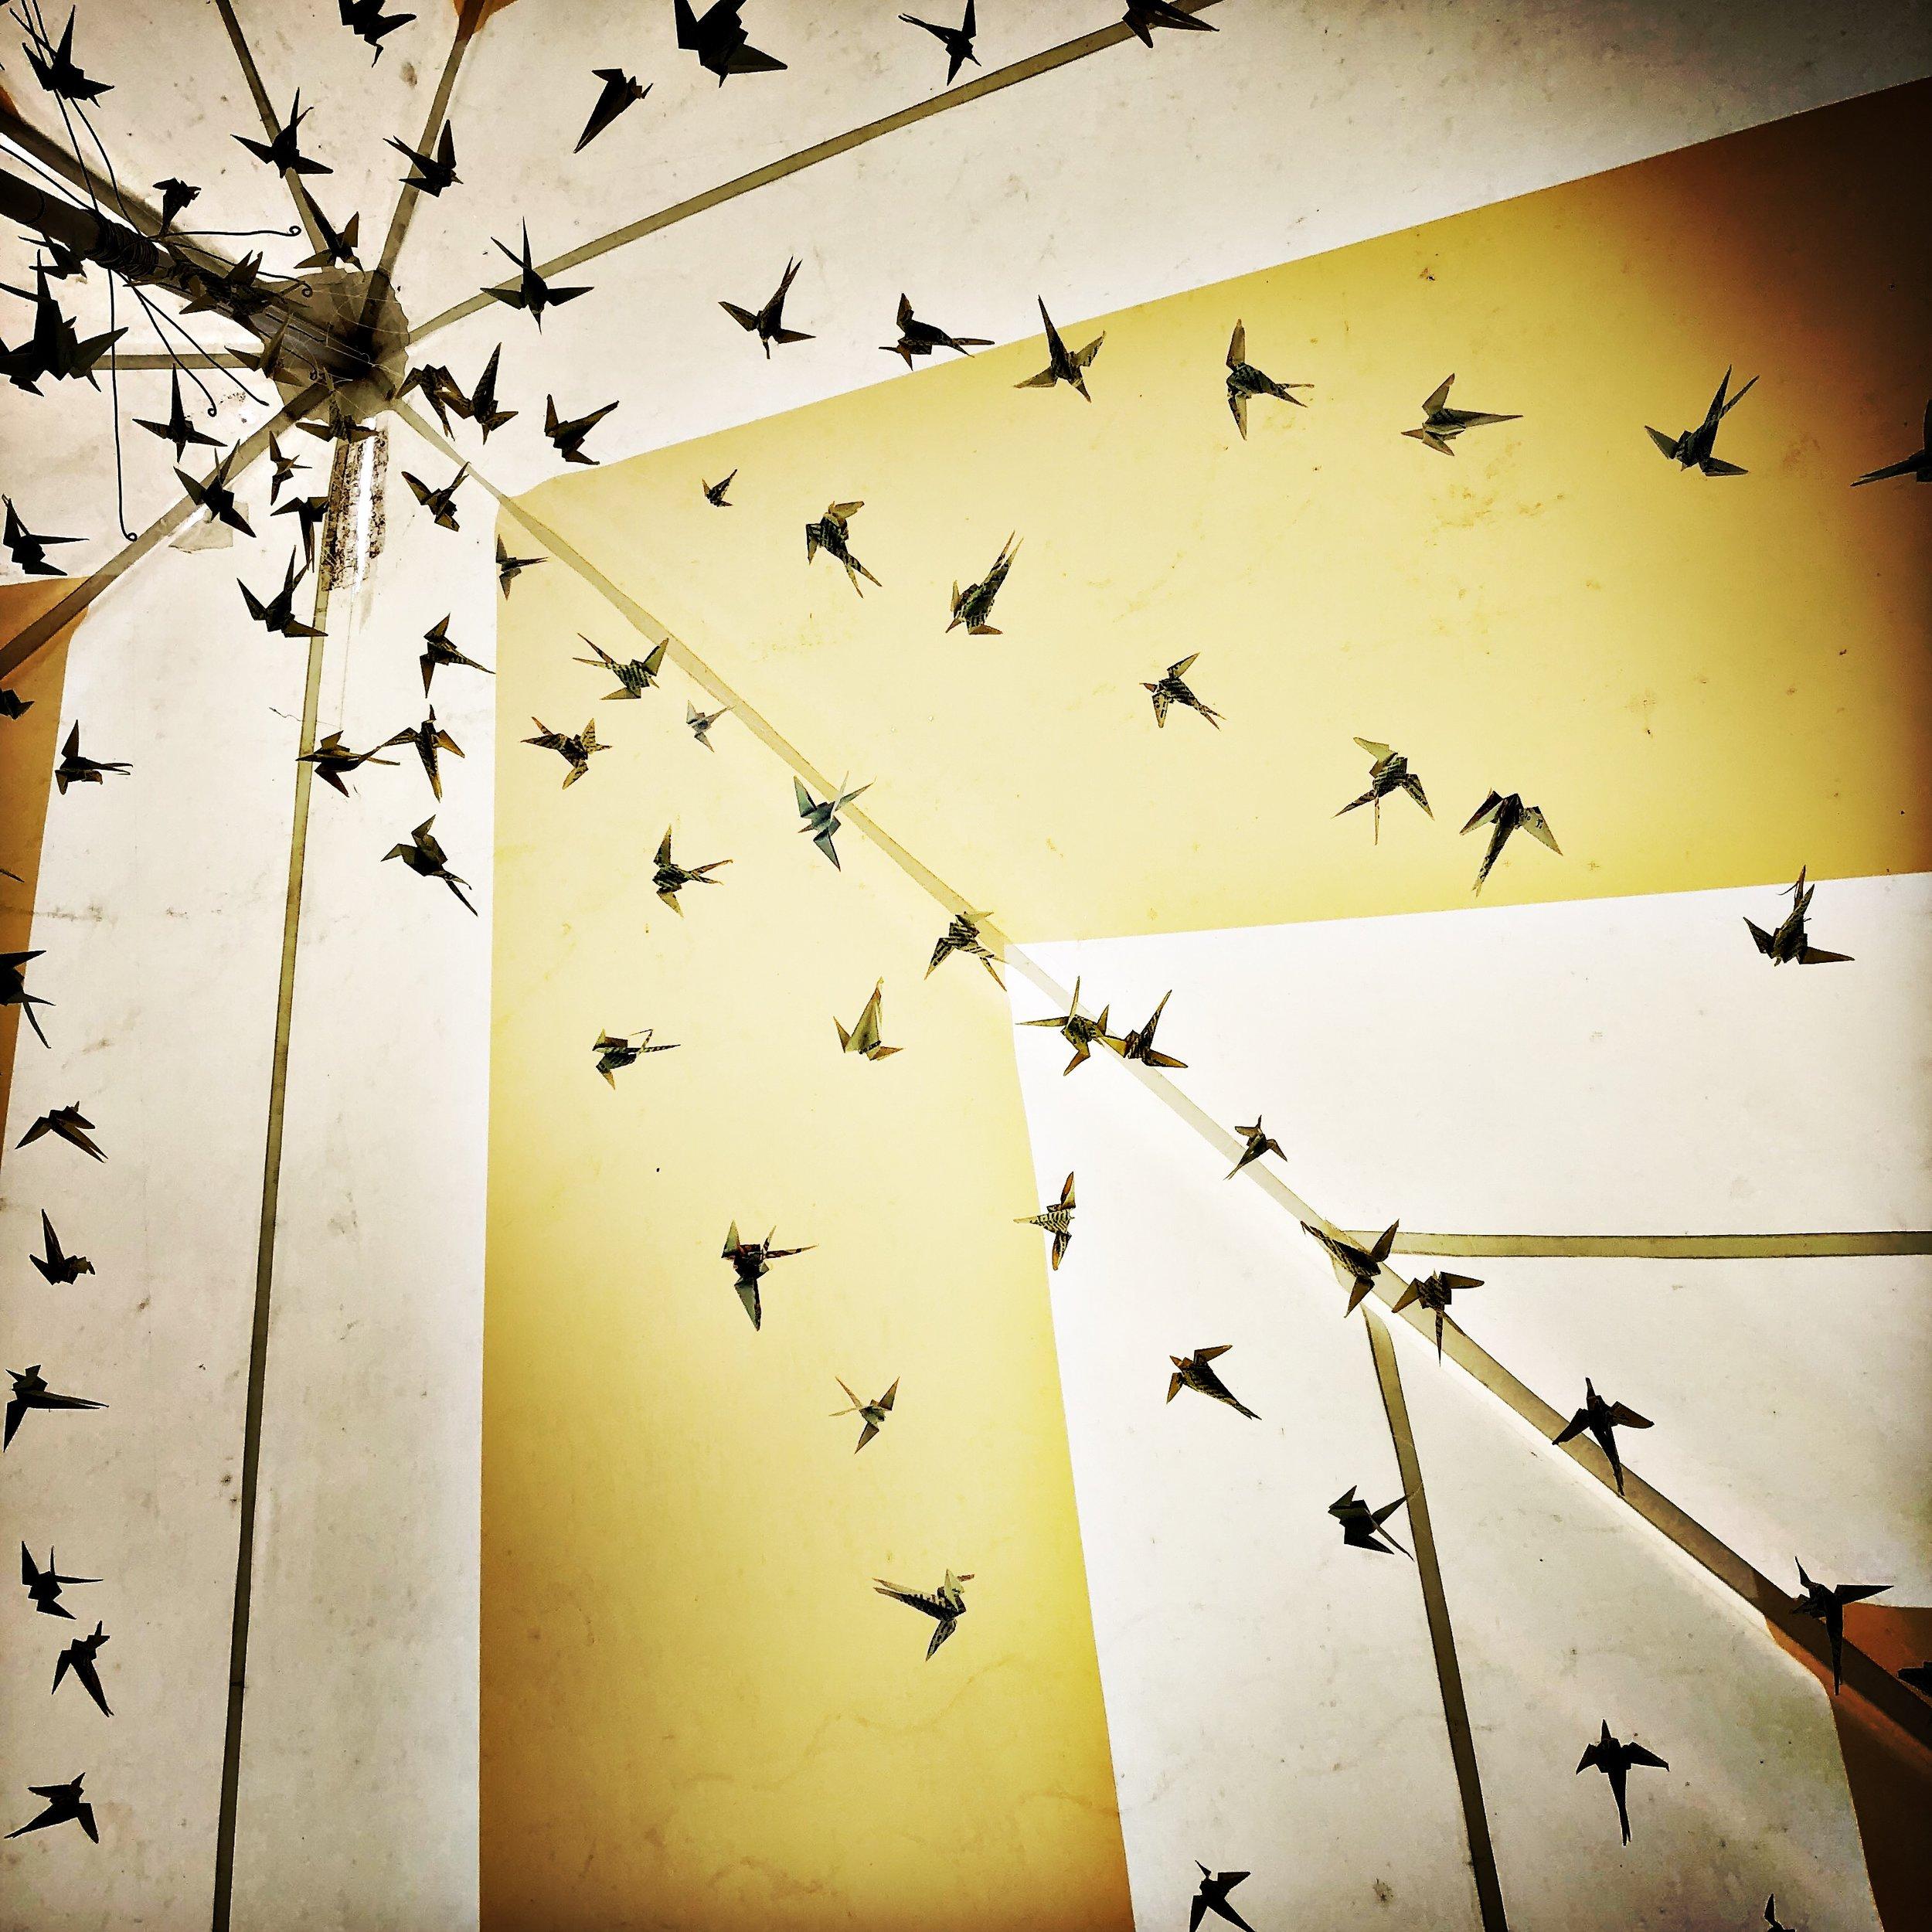 birdshot2.jpeg